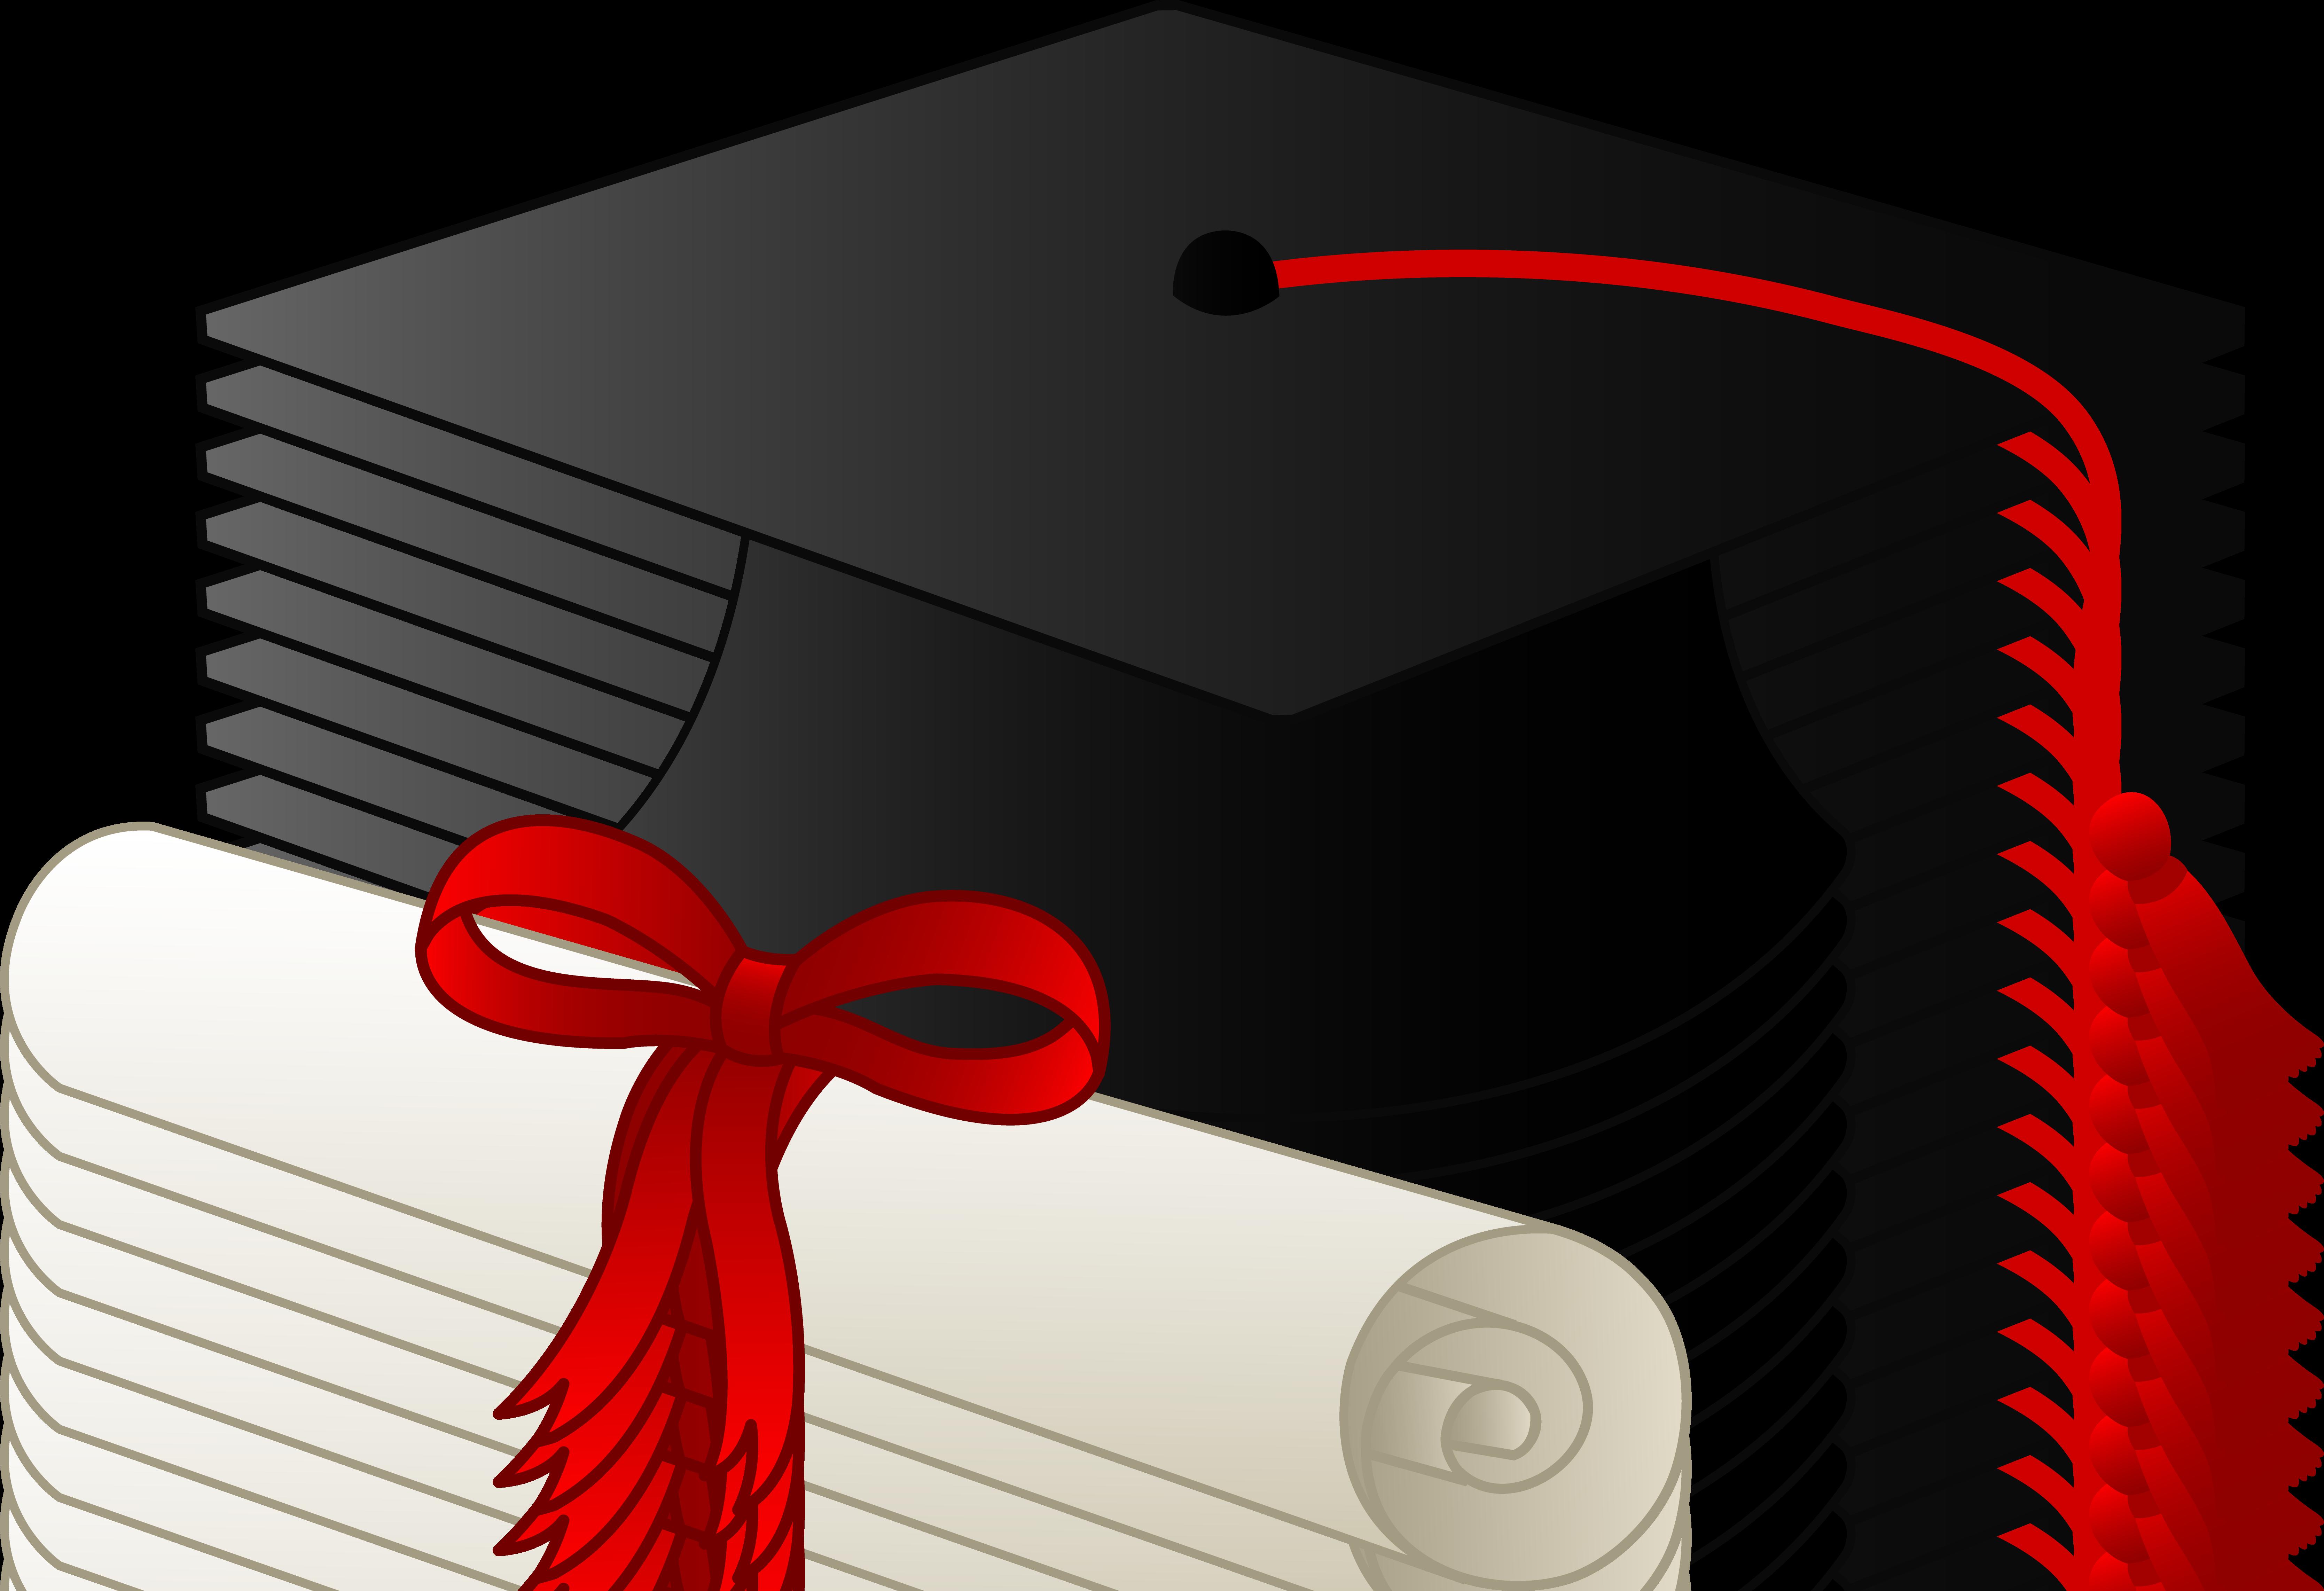 banner download Graduation clip art borders. Banner clipart college.